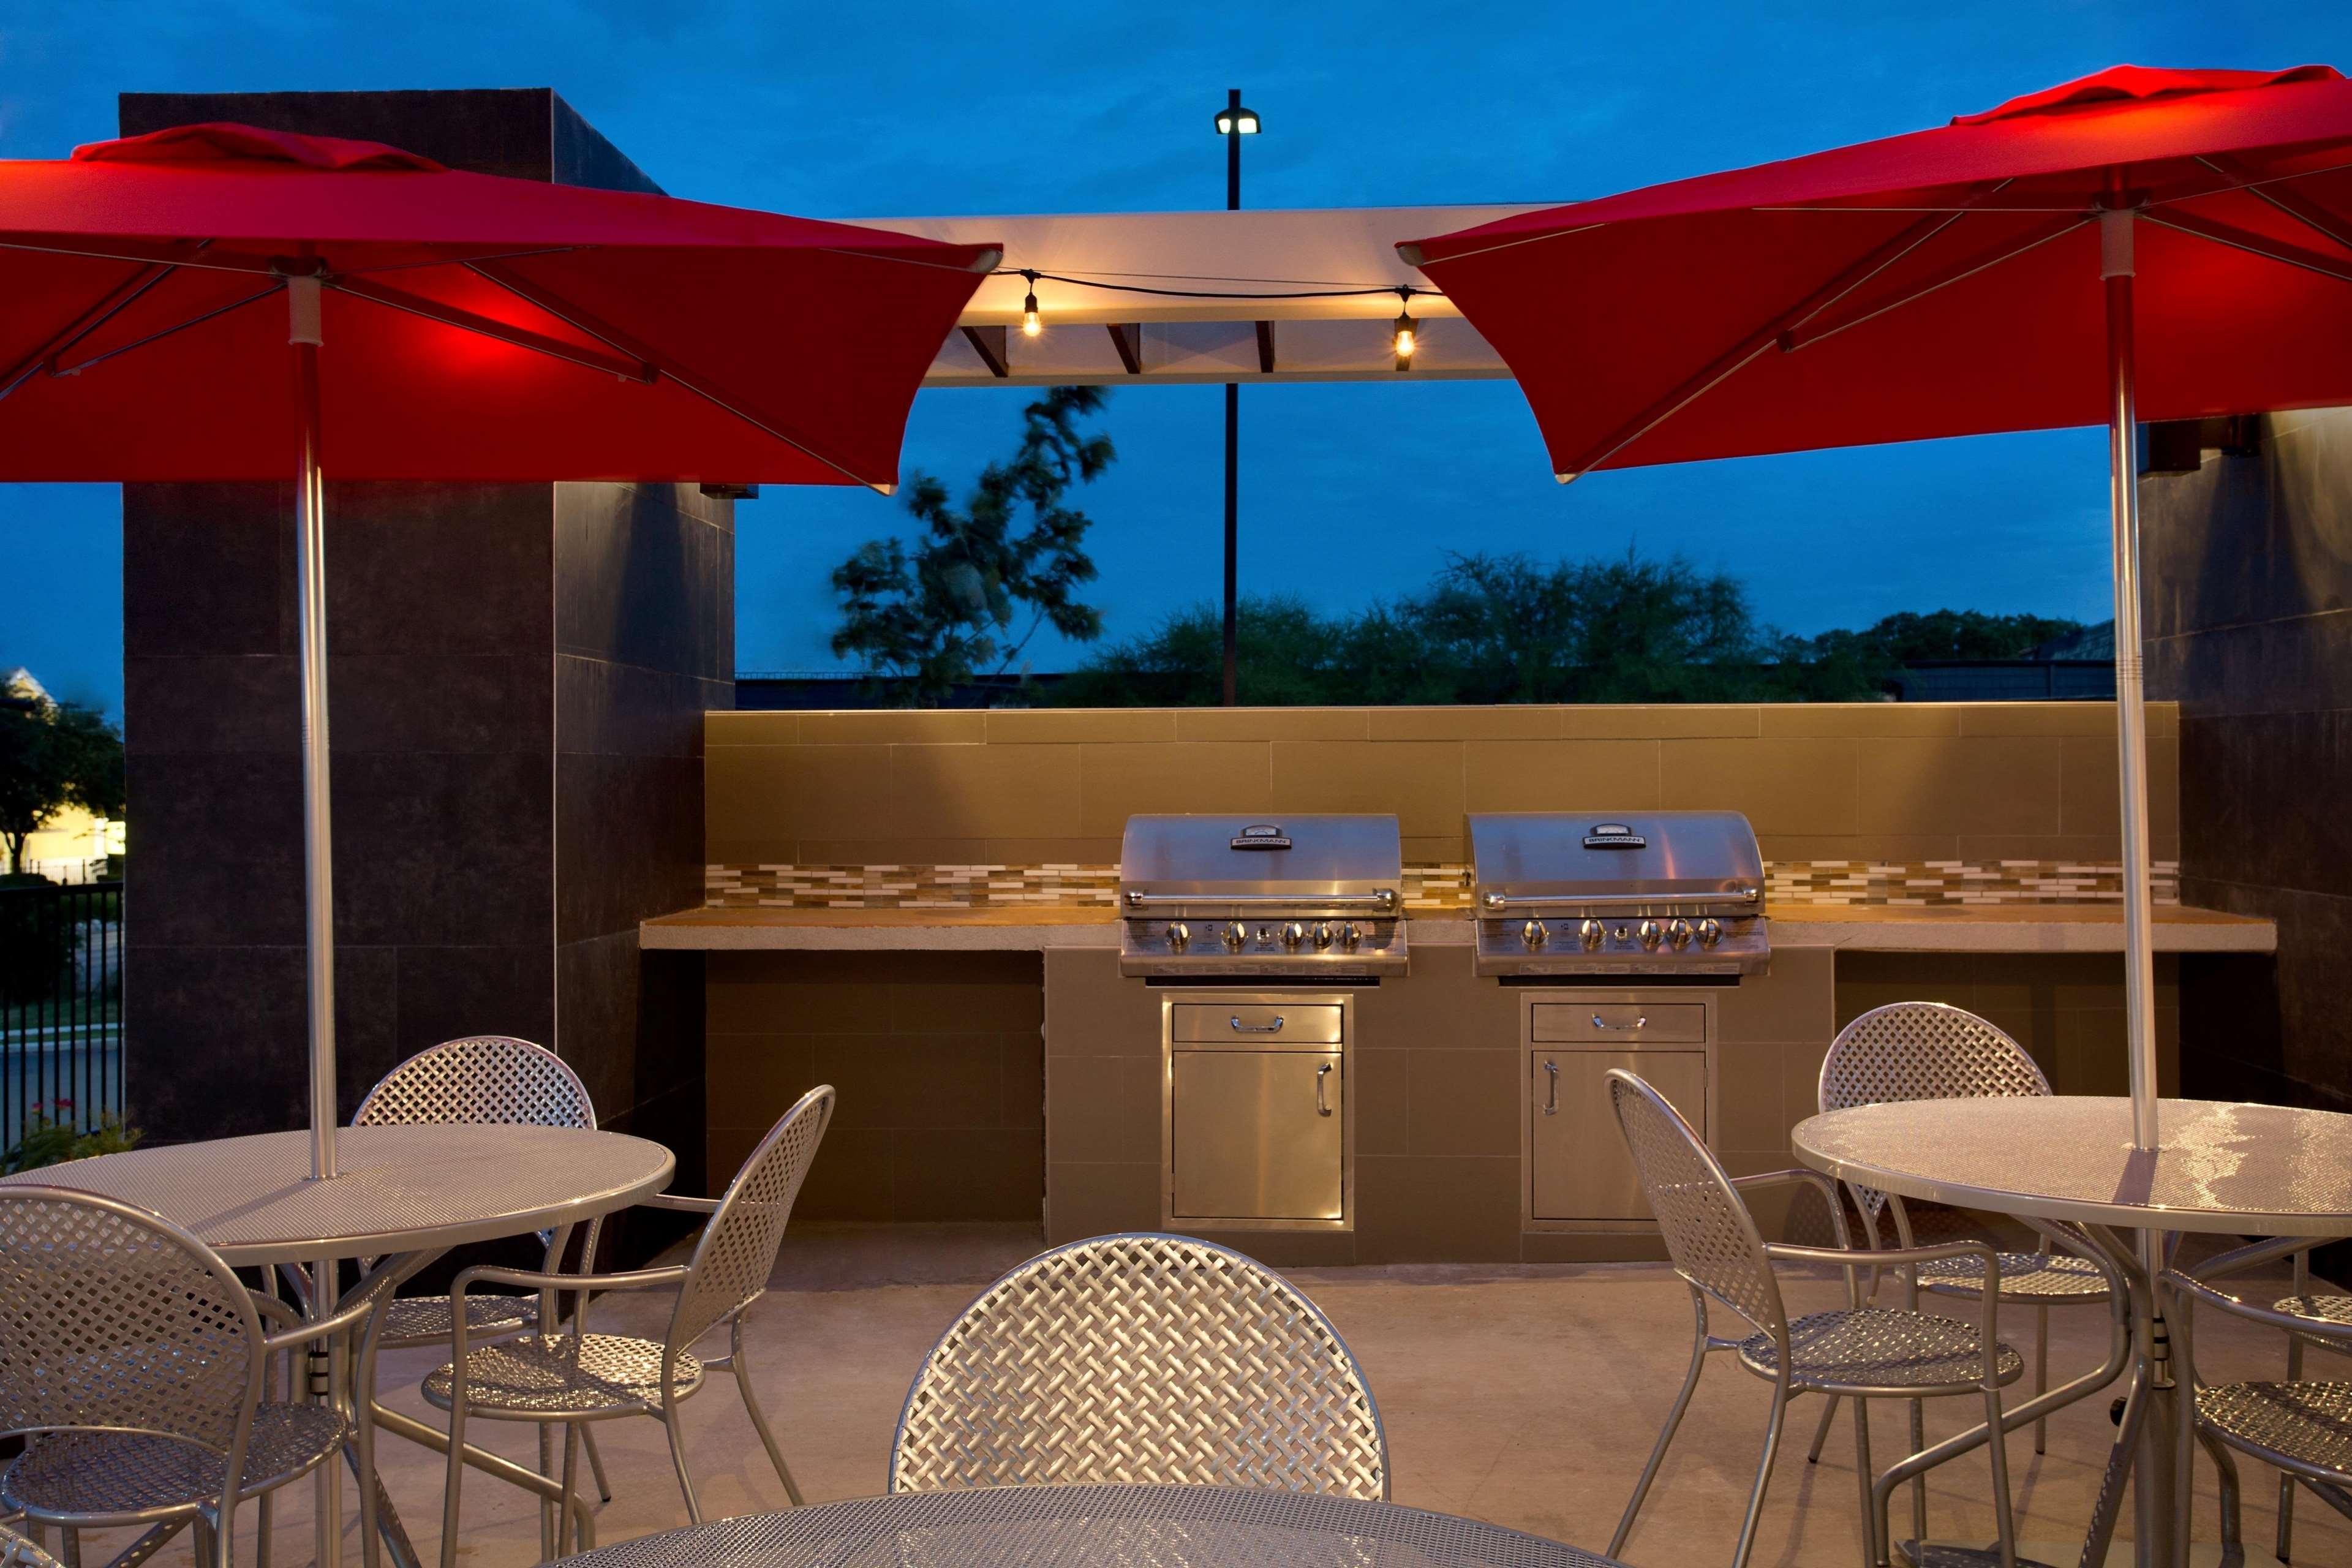 Home2 Suites by Hilton San Antonio Airport, TX image 9